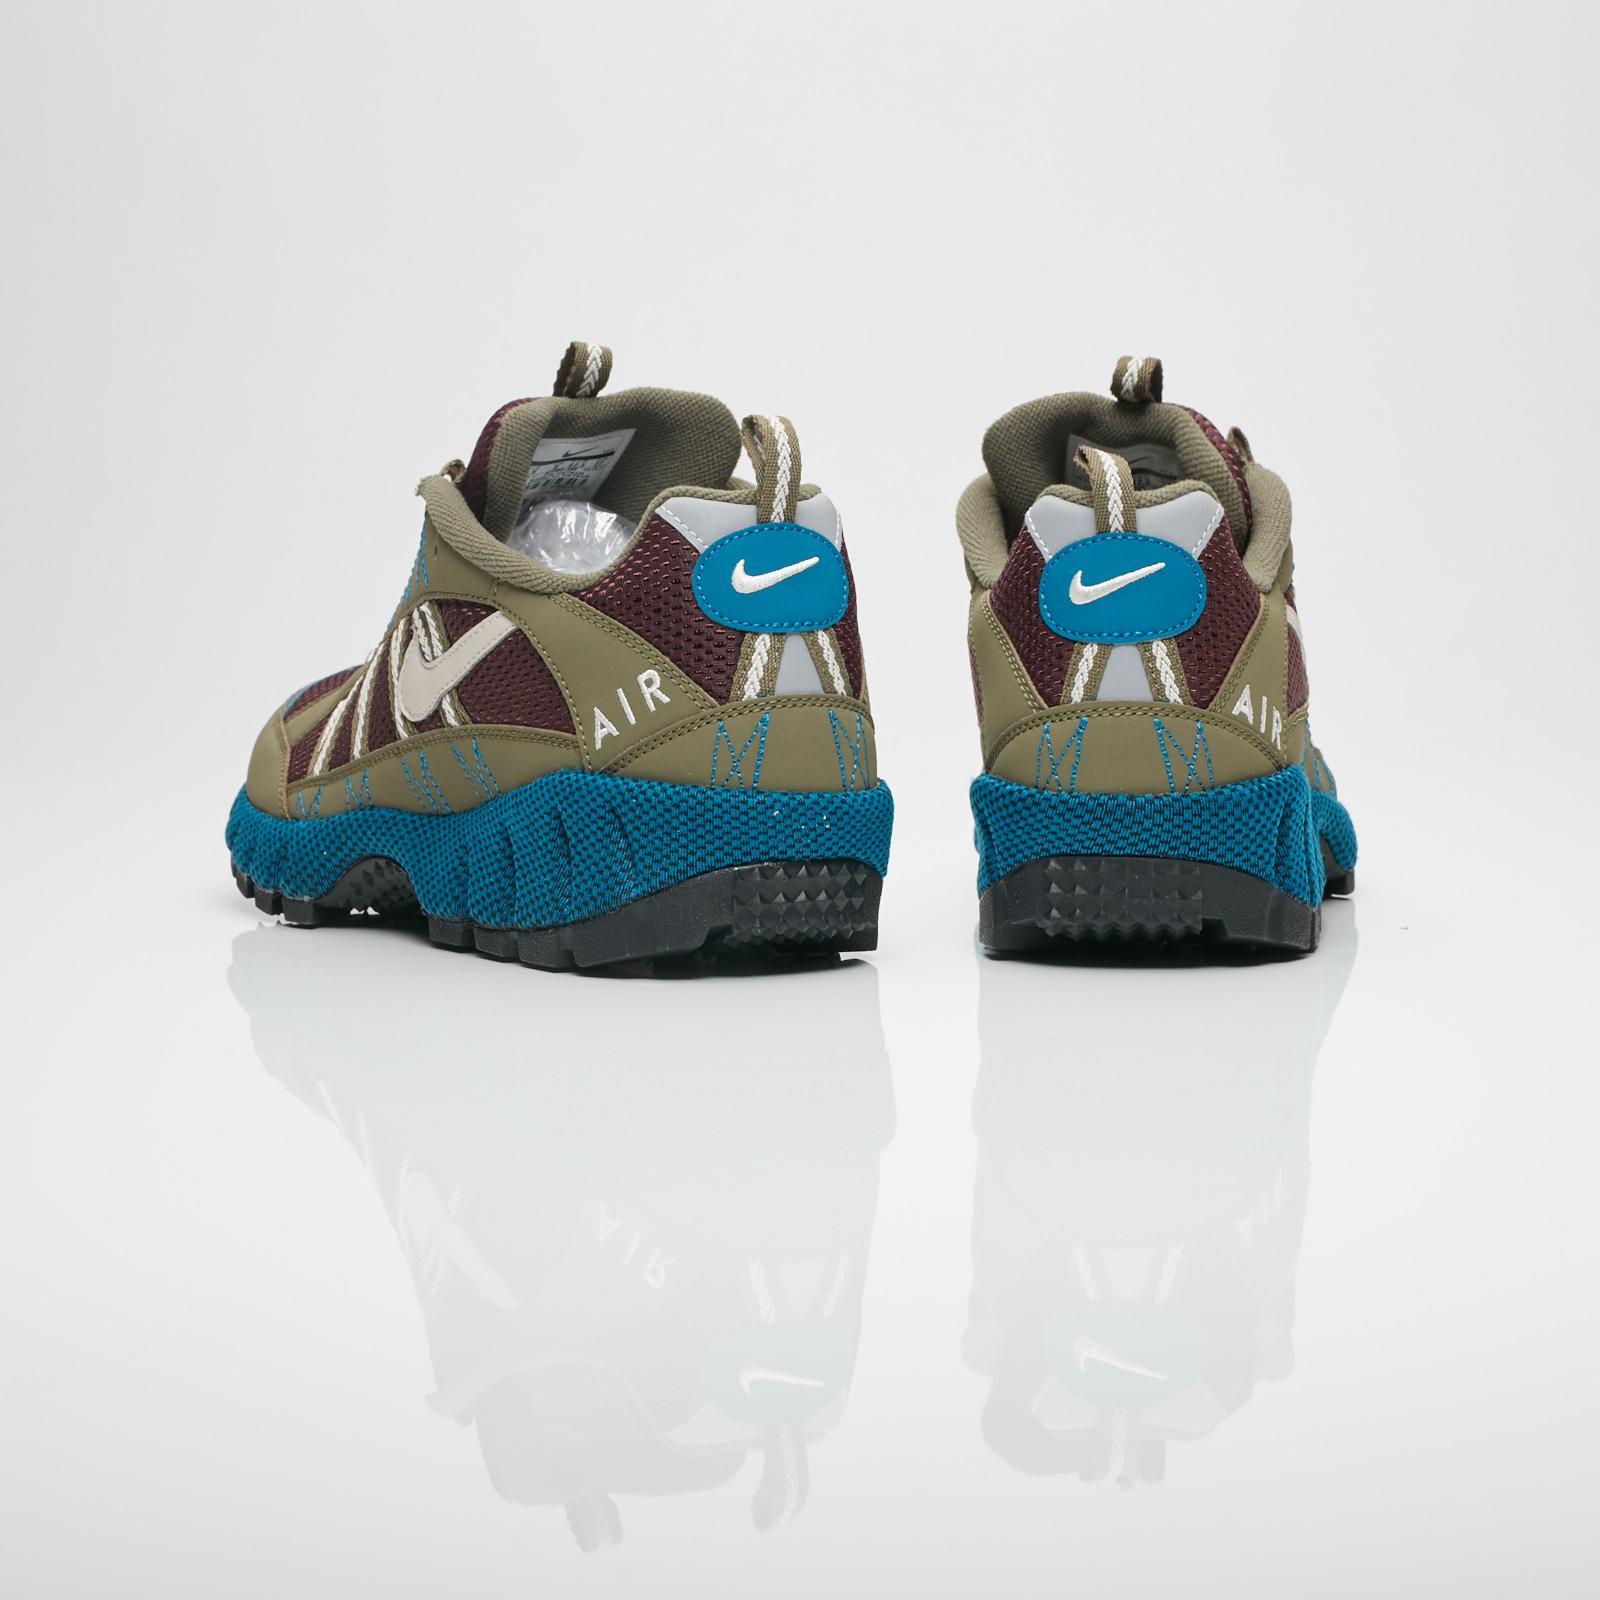 ed631da20fa Nike Sportswear Air Humara 17 Nike Sportswear Air Humara 17 ...